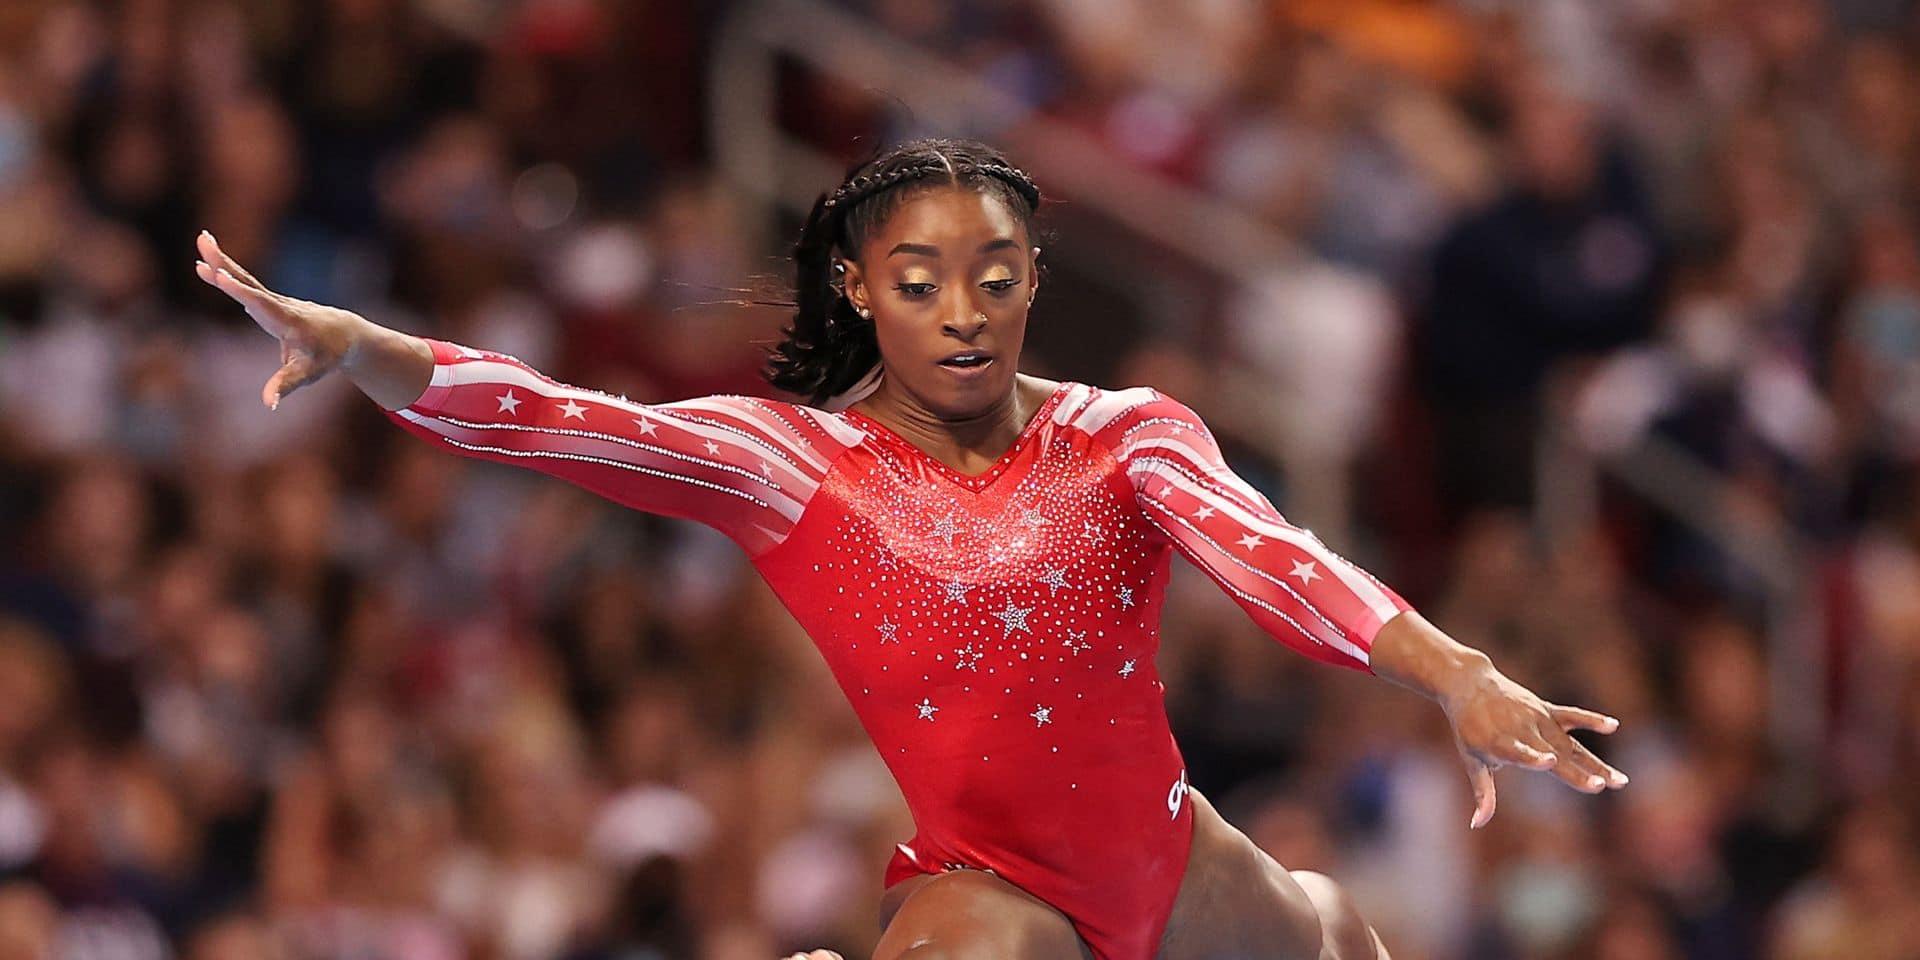 La gymnaste Simone Biles, première sportive à avoir son emoji sur Twitter